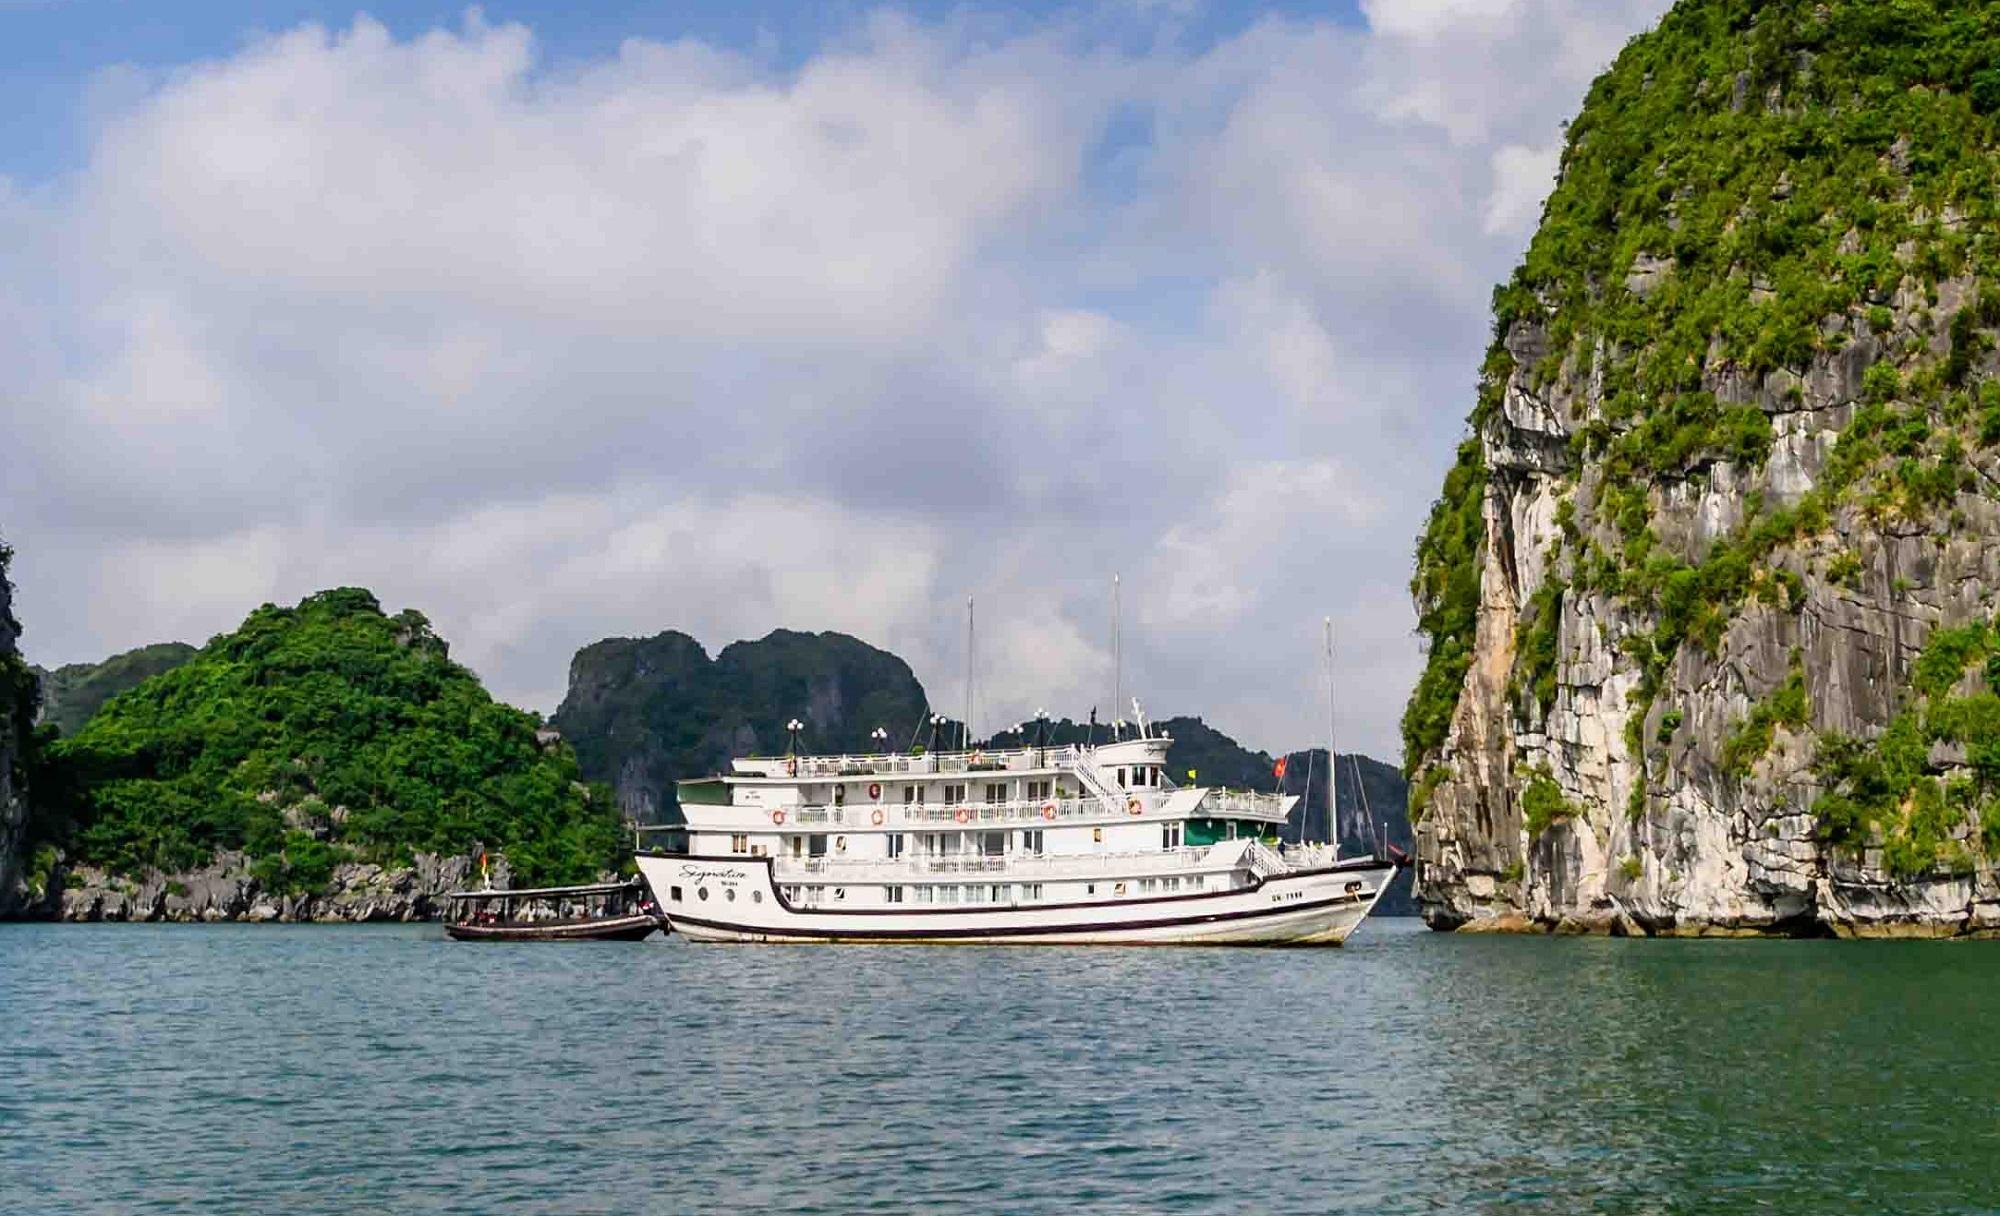 Cruise in Bai Tu Long Bay